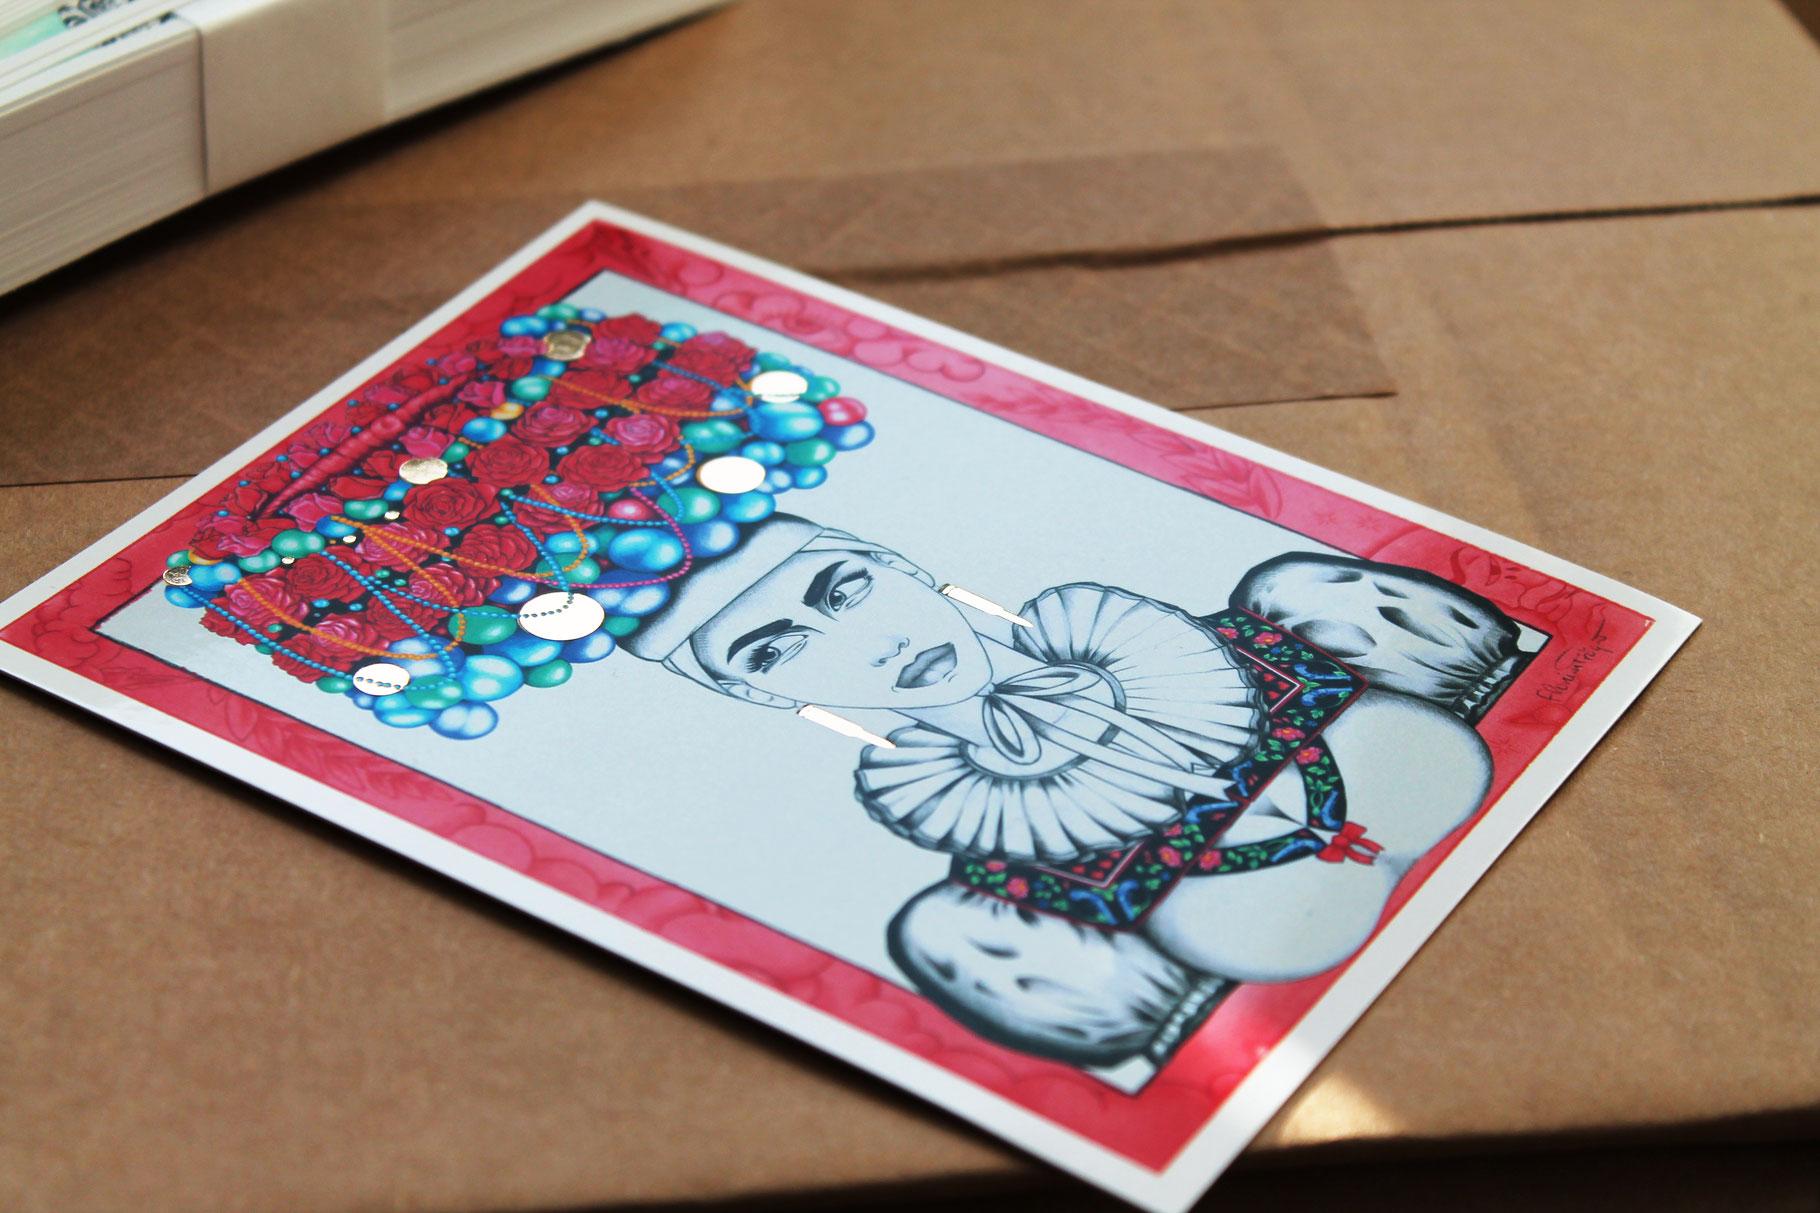 Brautkrone  Kunst Fine Art Prints Papeterie  Co